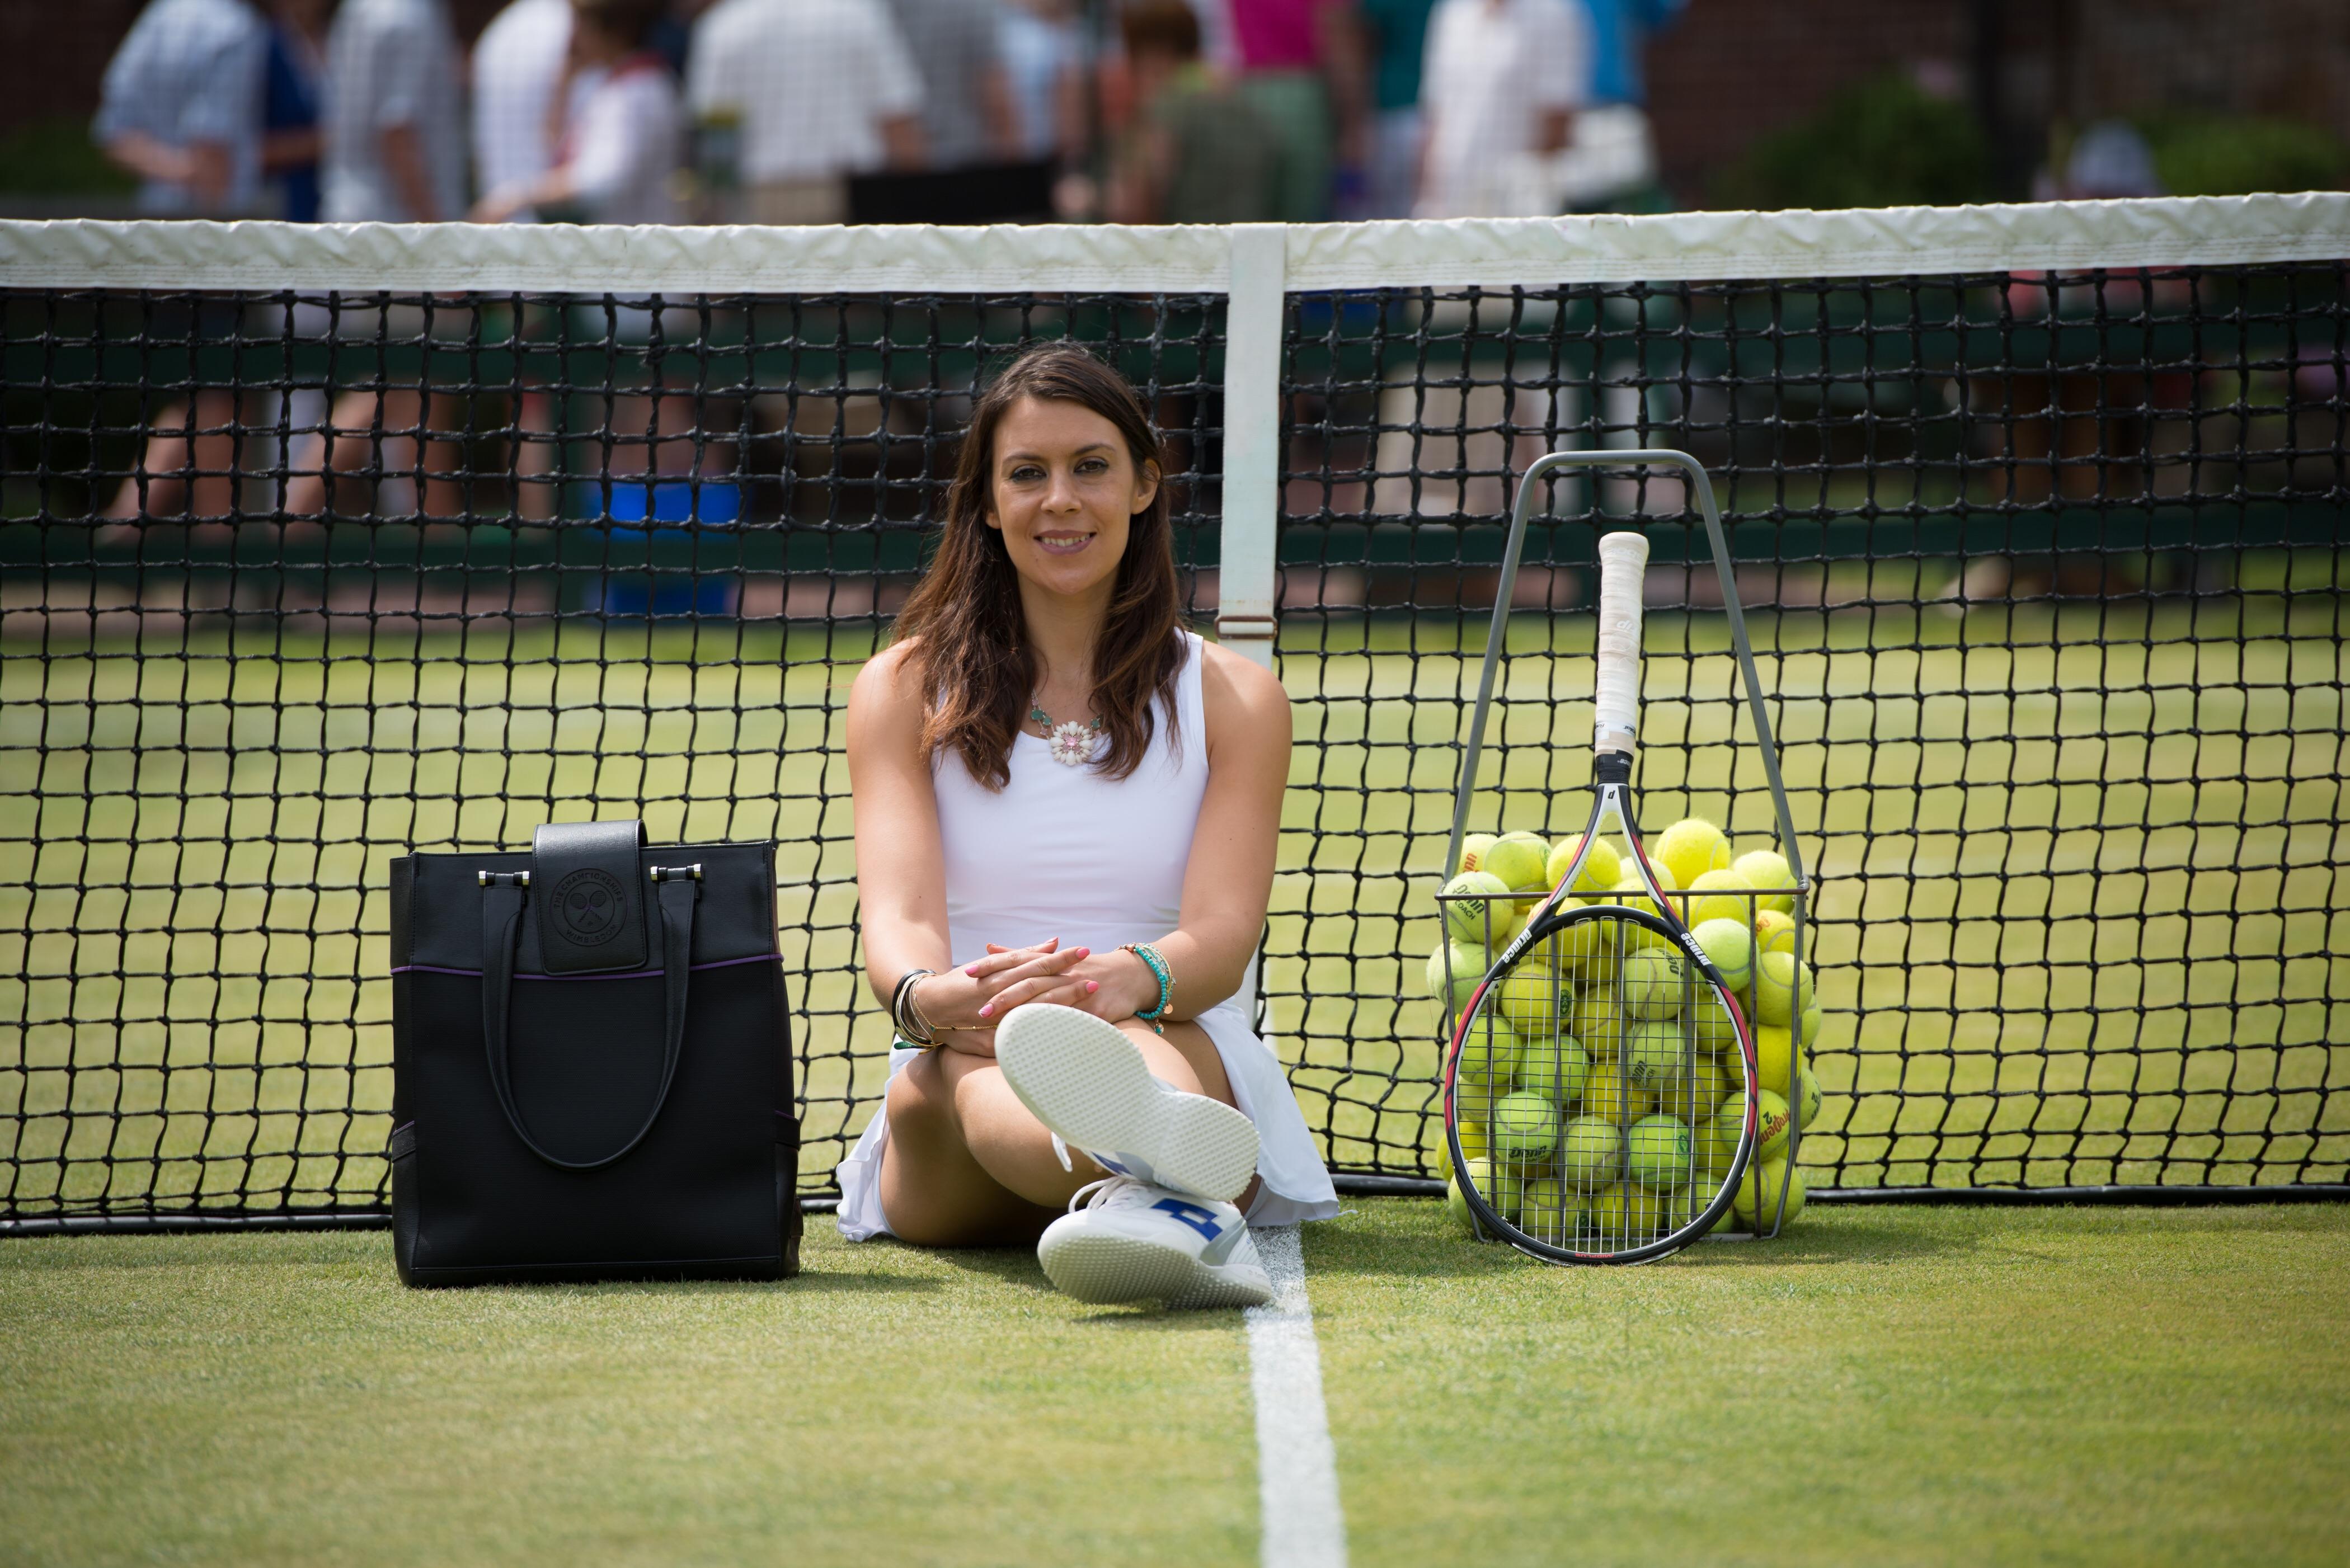 2015 Exclusive Wimbledon Tennis Bag: A Winner Among Champions